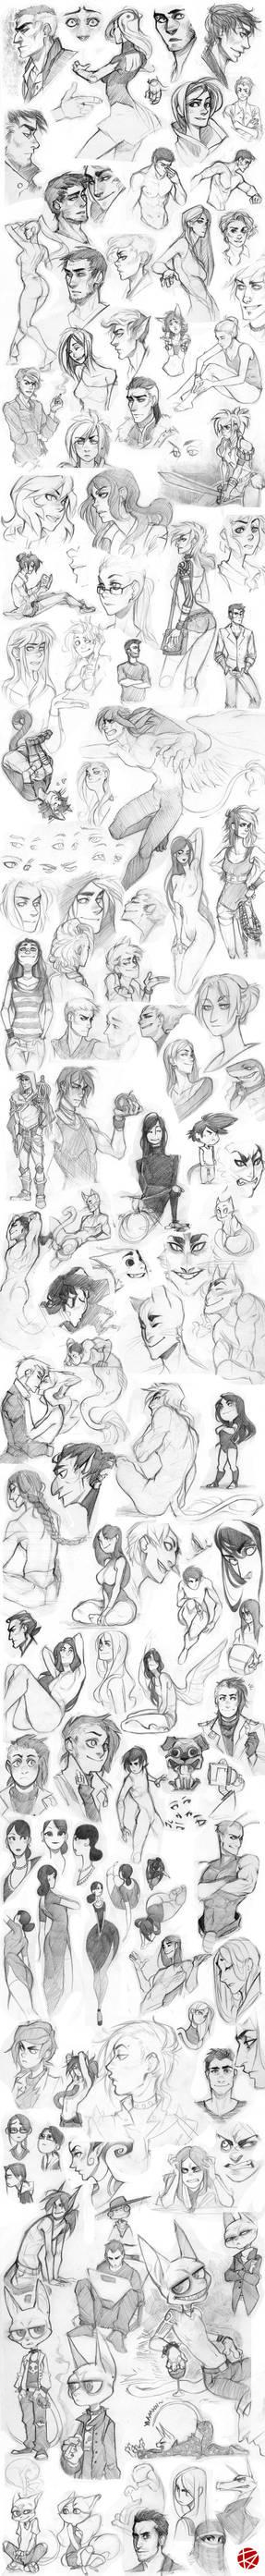 Sketch dump 01 by GoldenTar